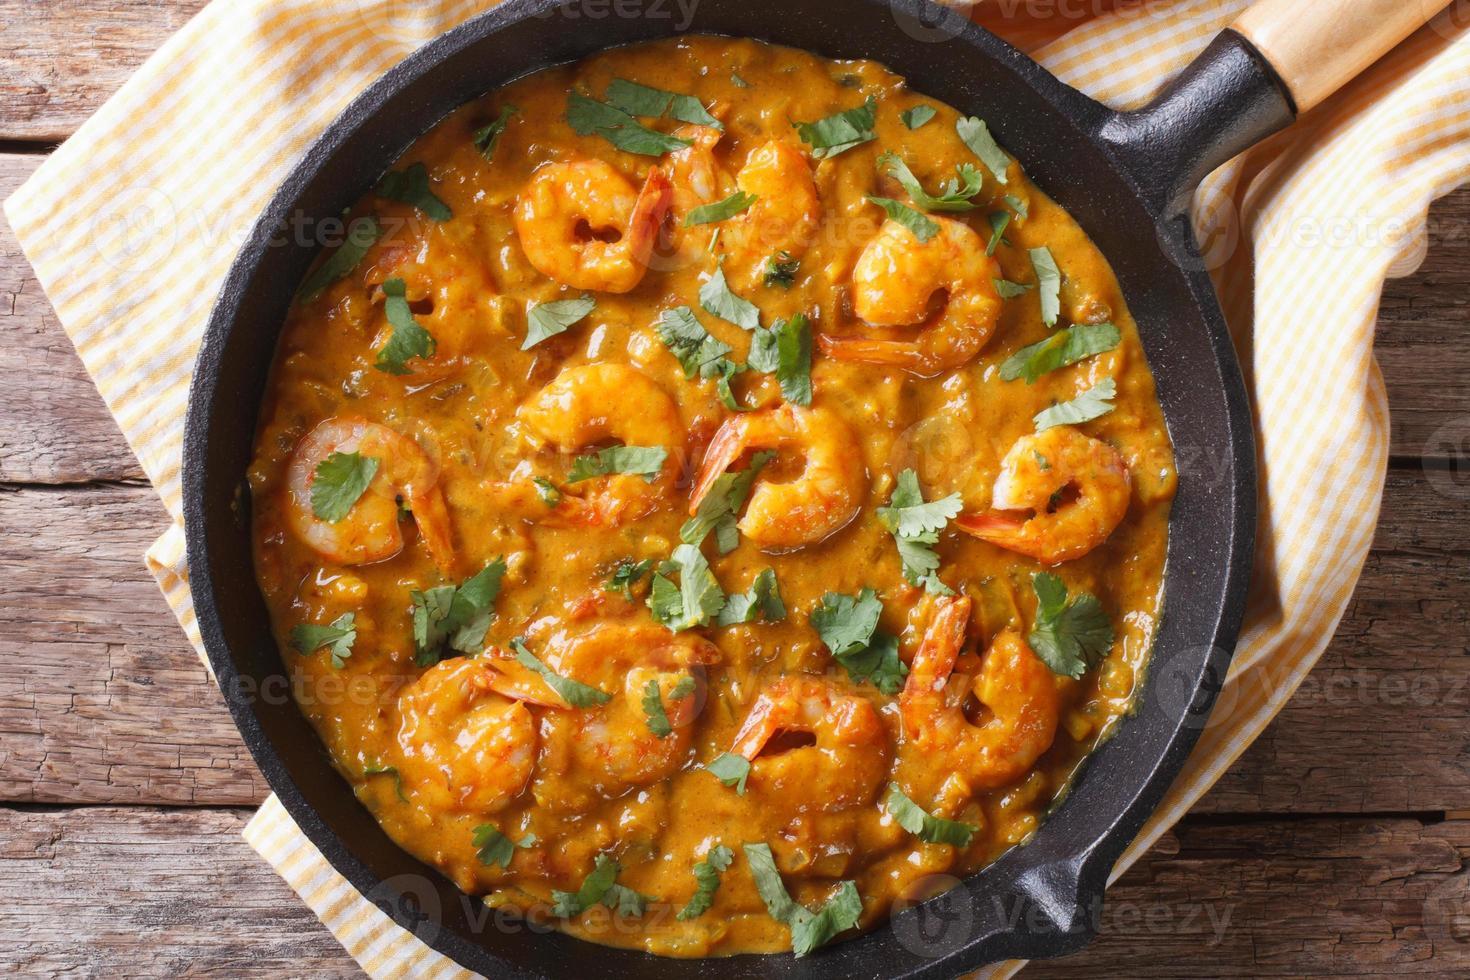 crevettes, curry, sauce, casserole, gros plan, horizontal, sommet, vue photo